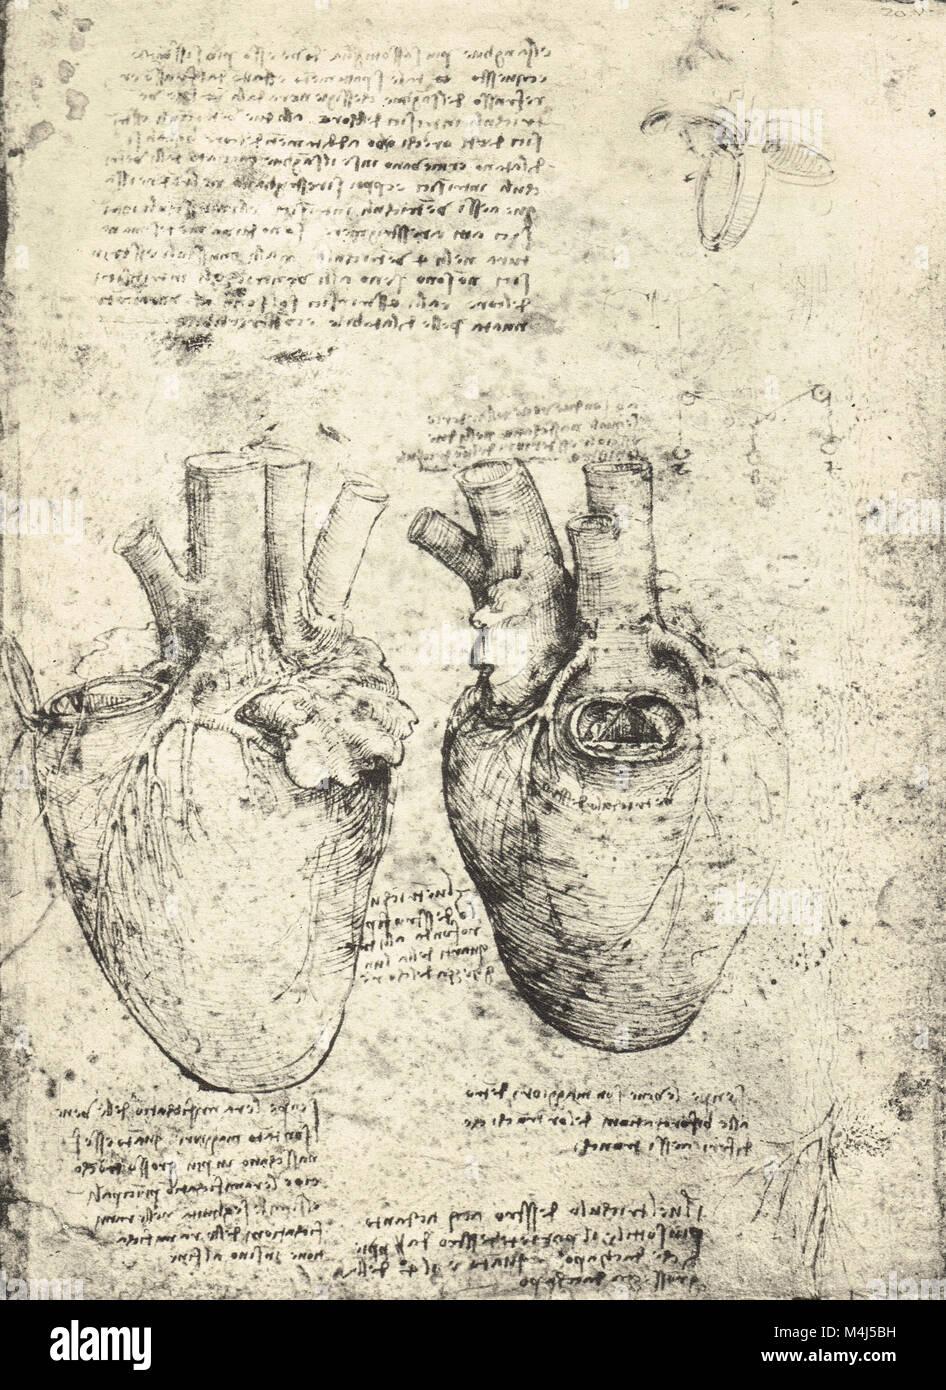 Drawn By Leonardo Da Vinci Imágenes De Stock & Drawn By Leonardo Da ...